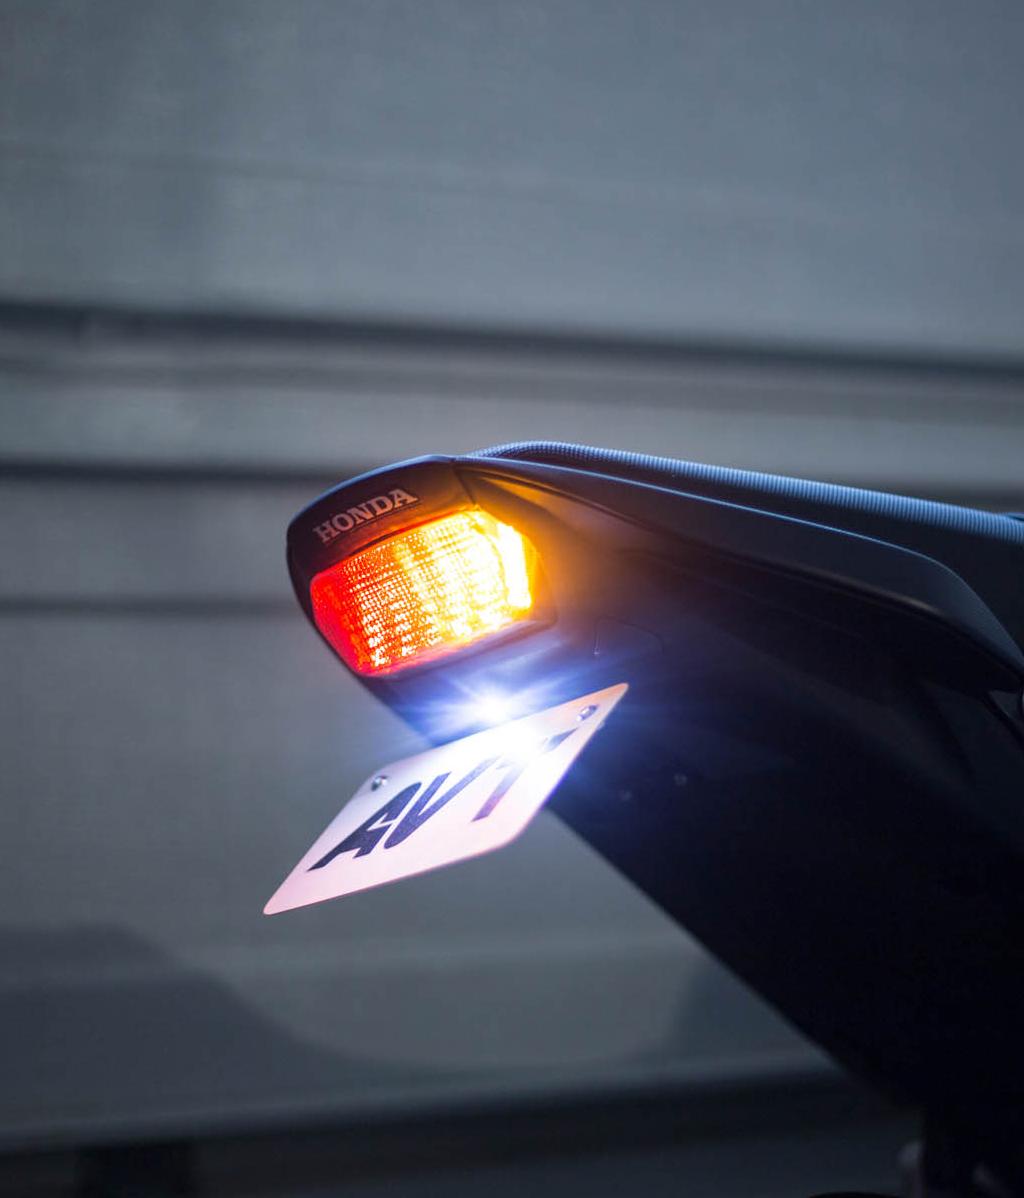 Integrated LED Turn Signals v2 AVT CB650F CBR650F Fender Eliminator Kit